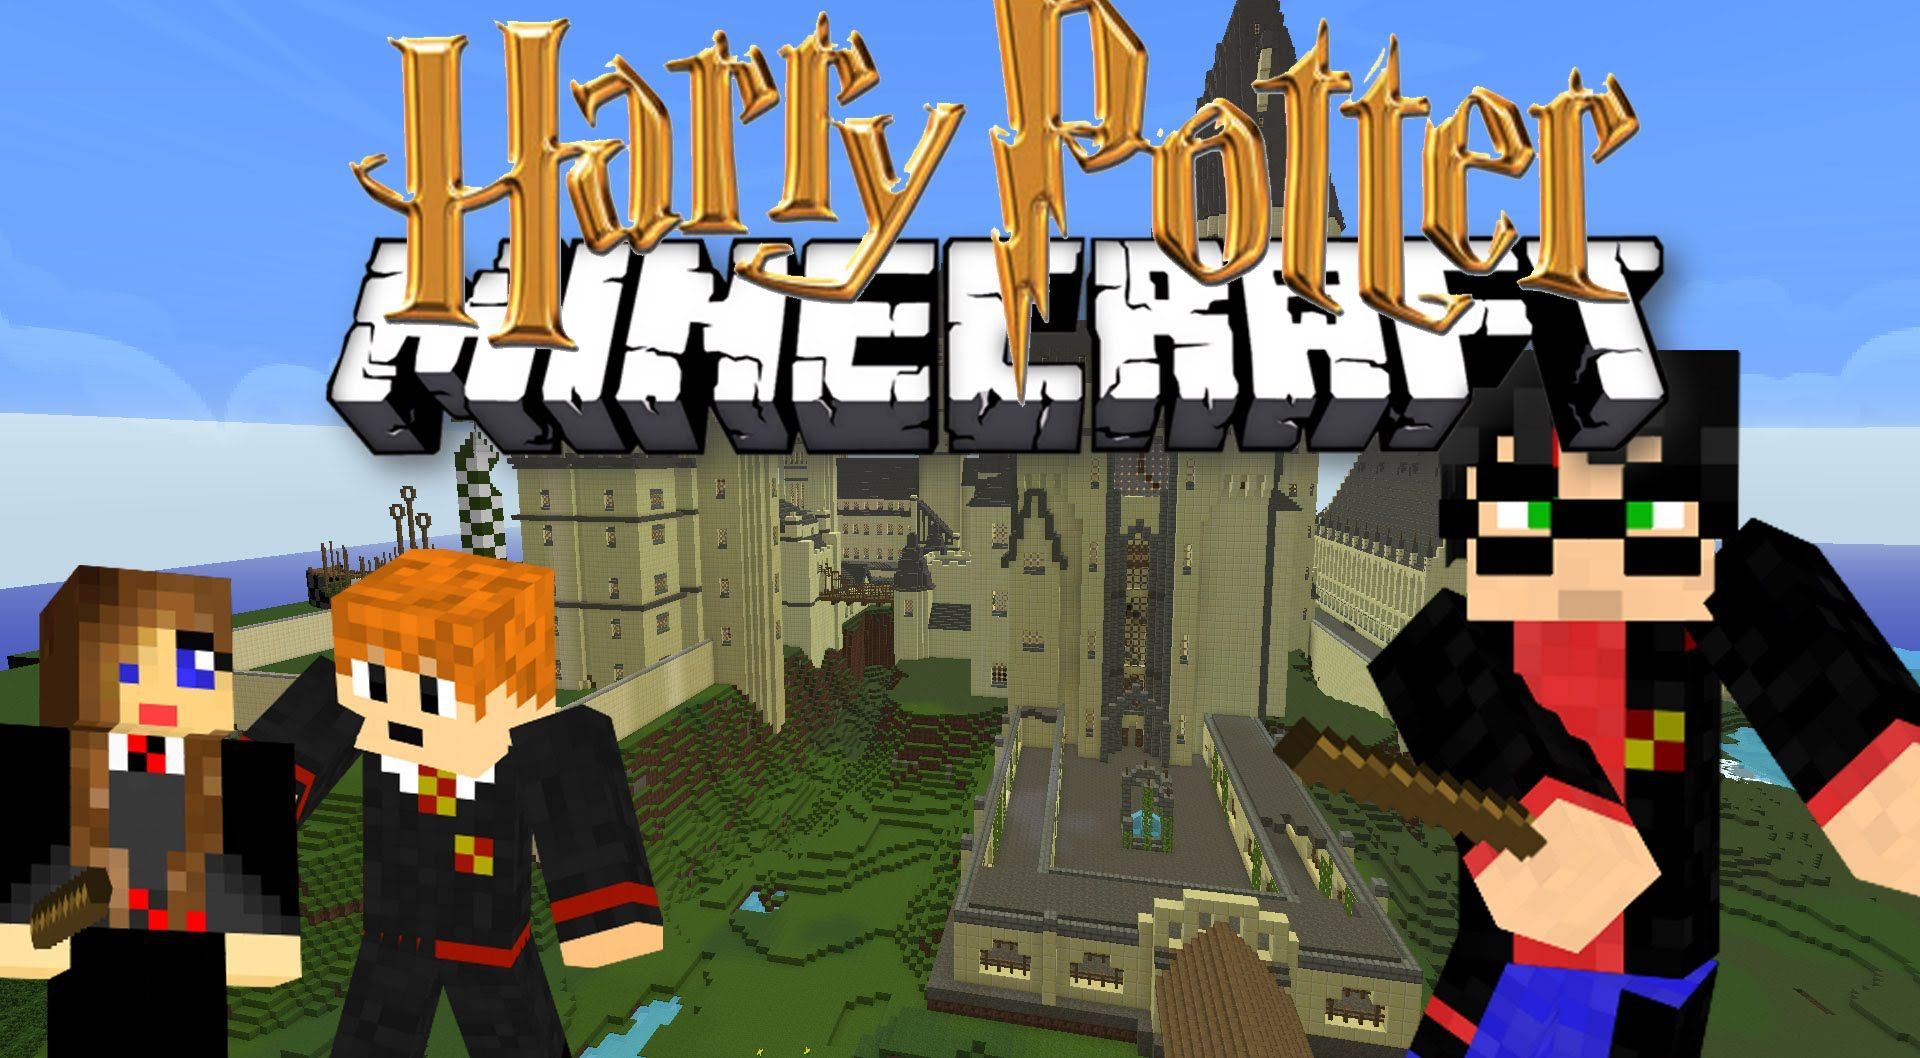 Harry Potter Adventure Map 1.12.2/1.12 for Minecraft - 9Minecraft.Net